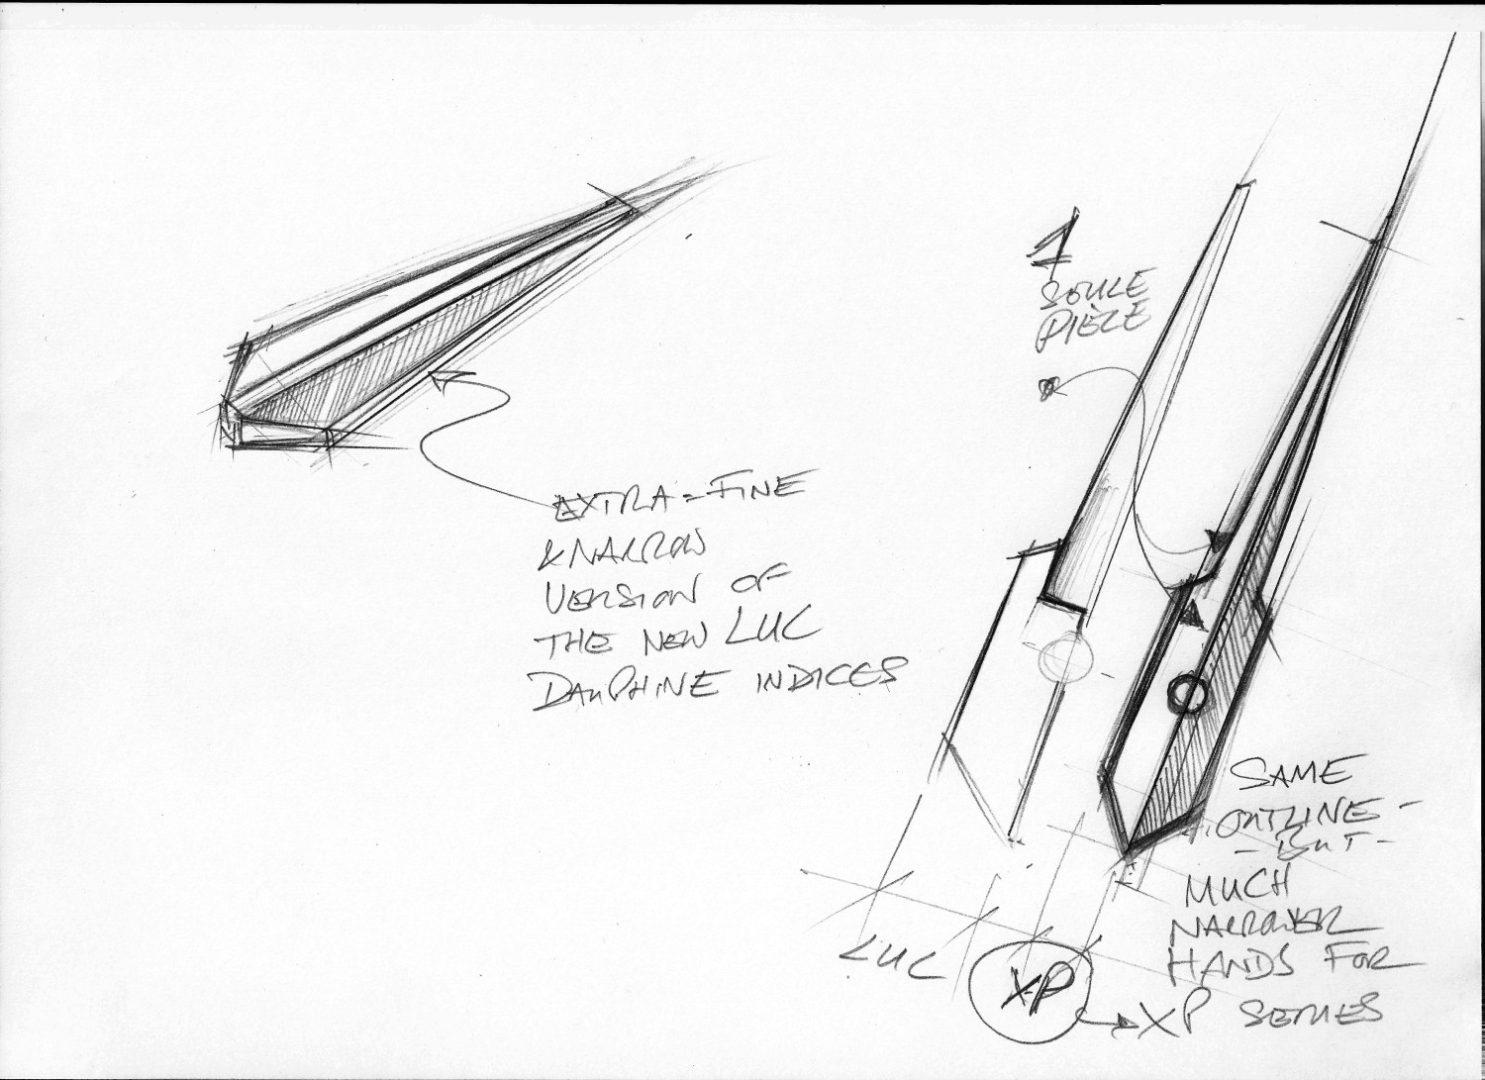 L.U.C XPS 1860 - Sketch 2 - Hands